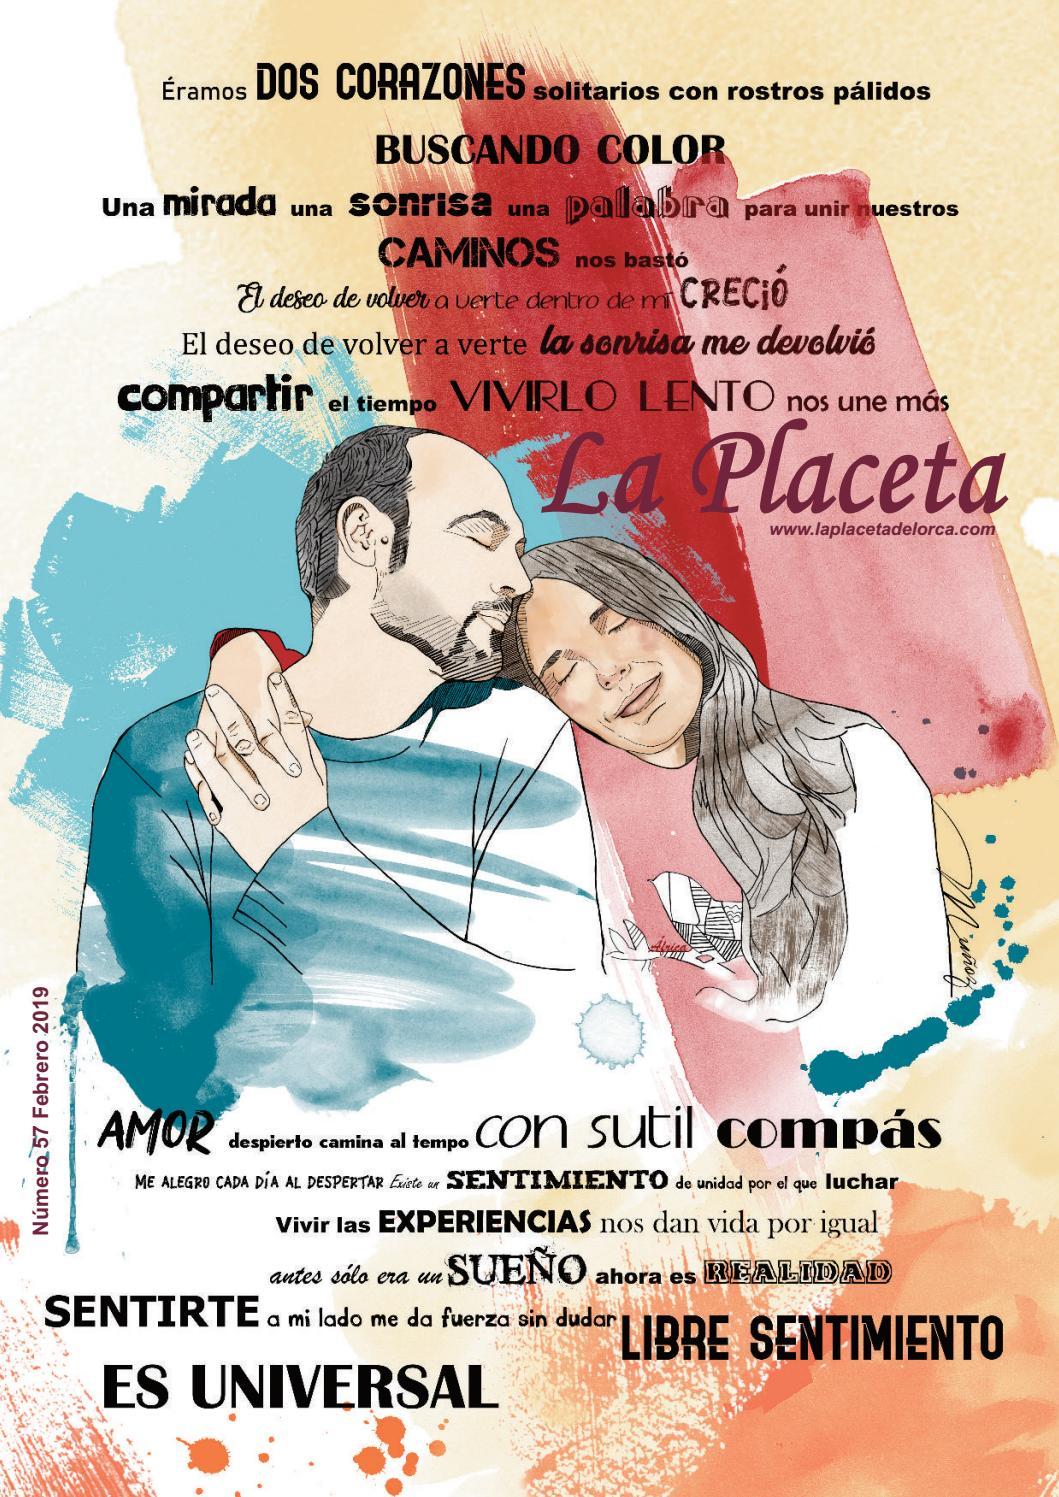 Dating Coach Madrid 873395